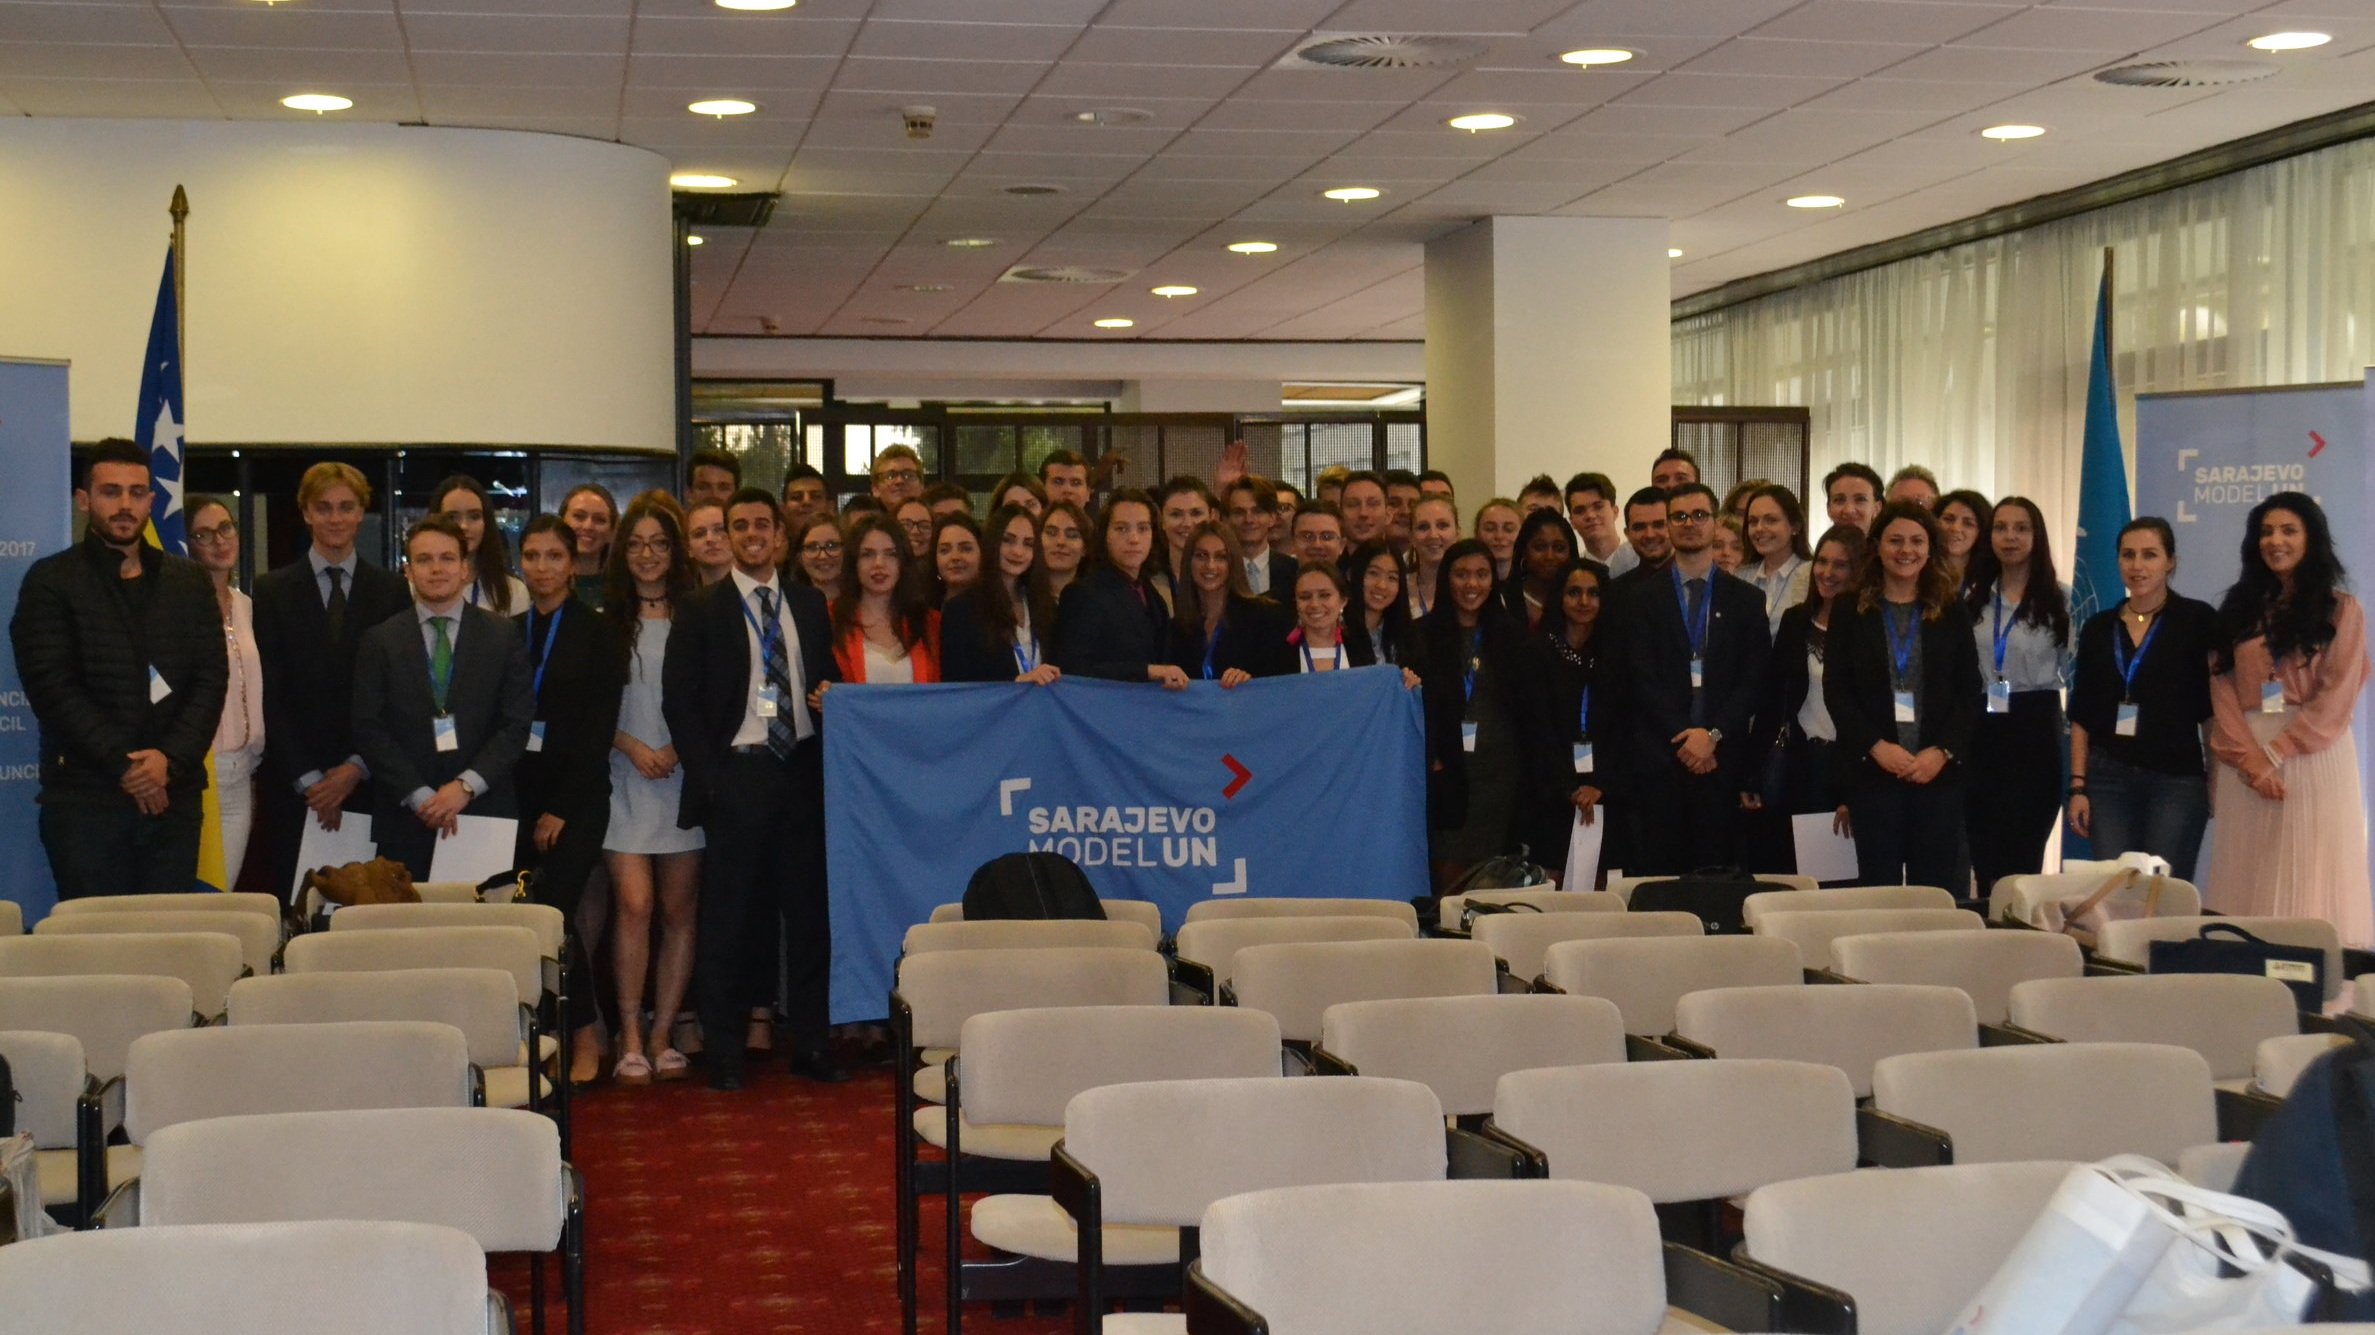 Sarajevo Model UN, Closing Ceremony